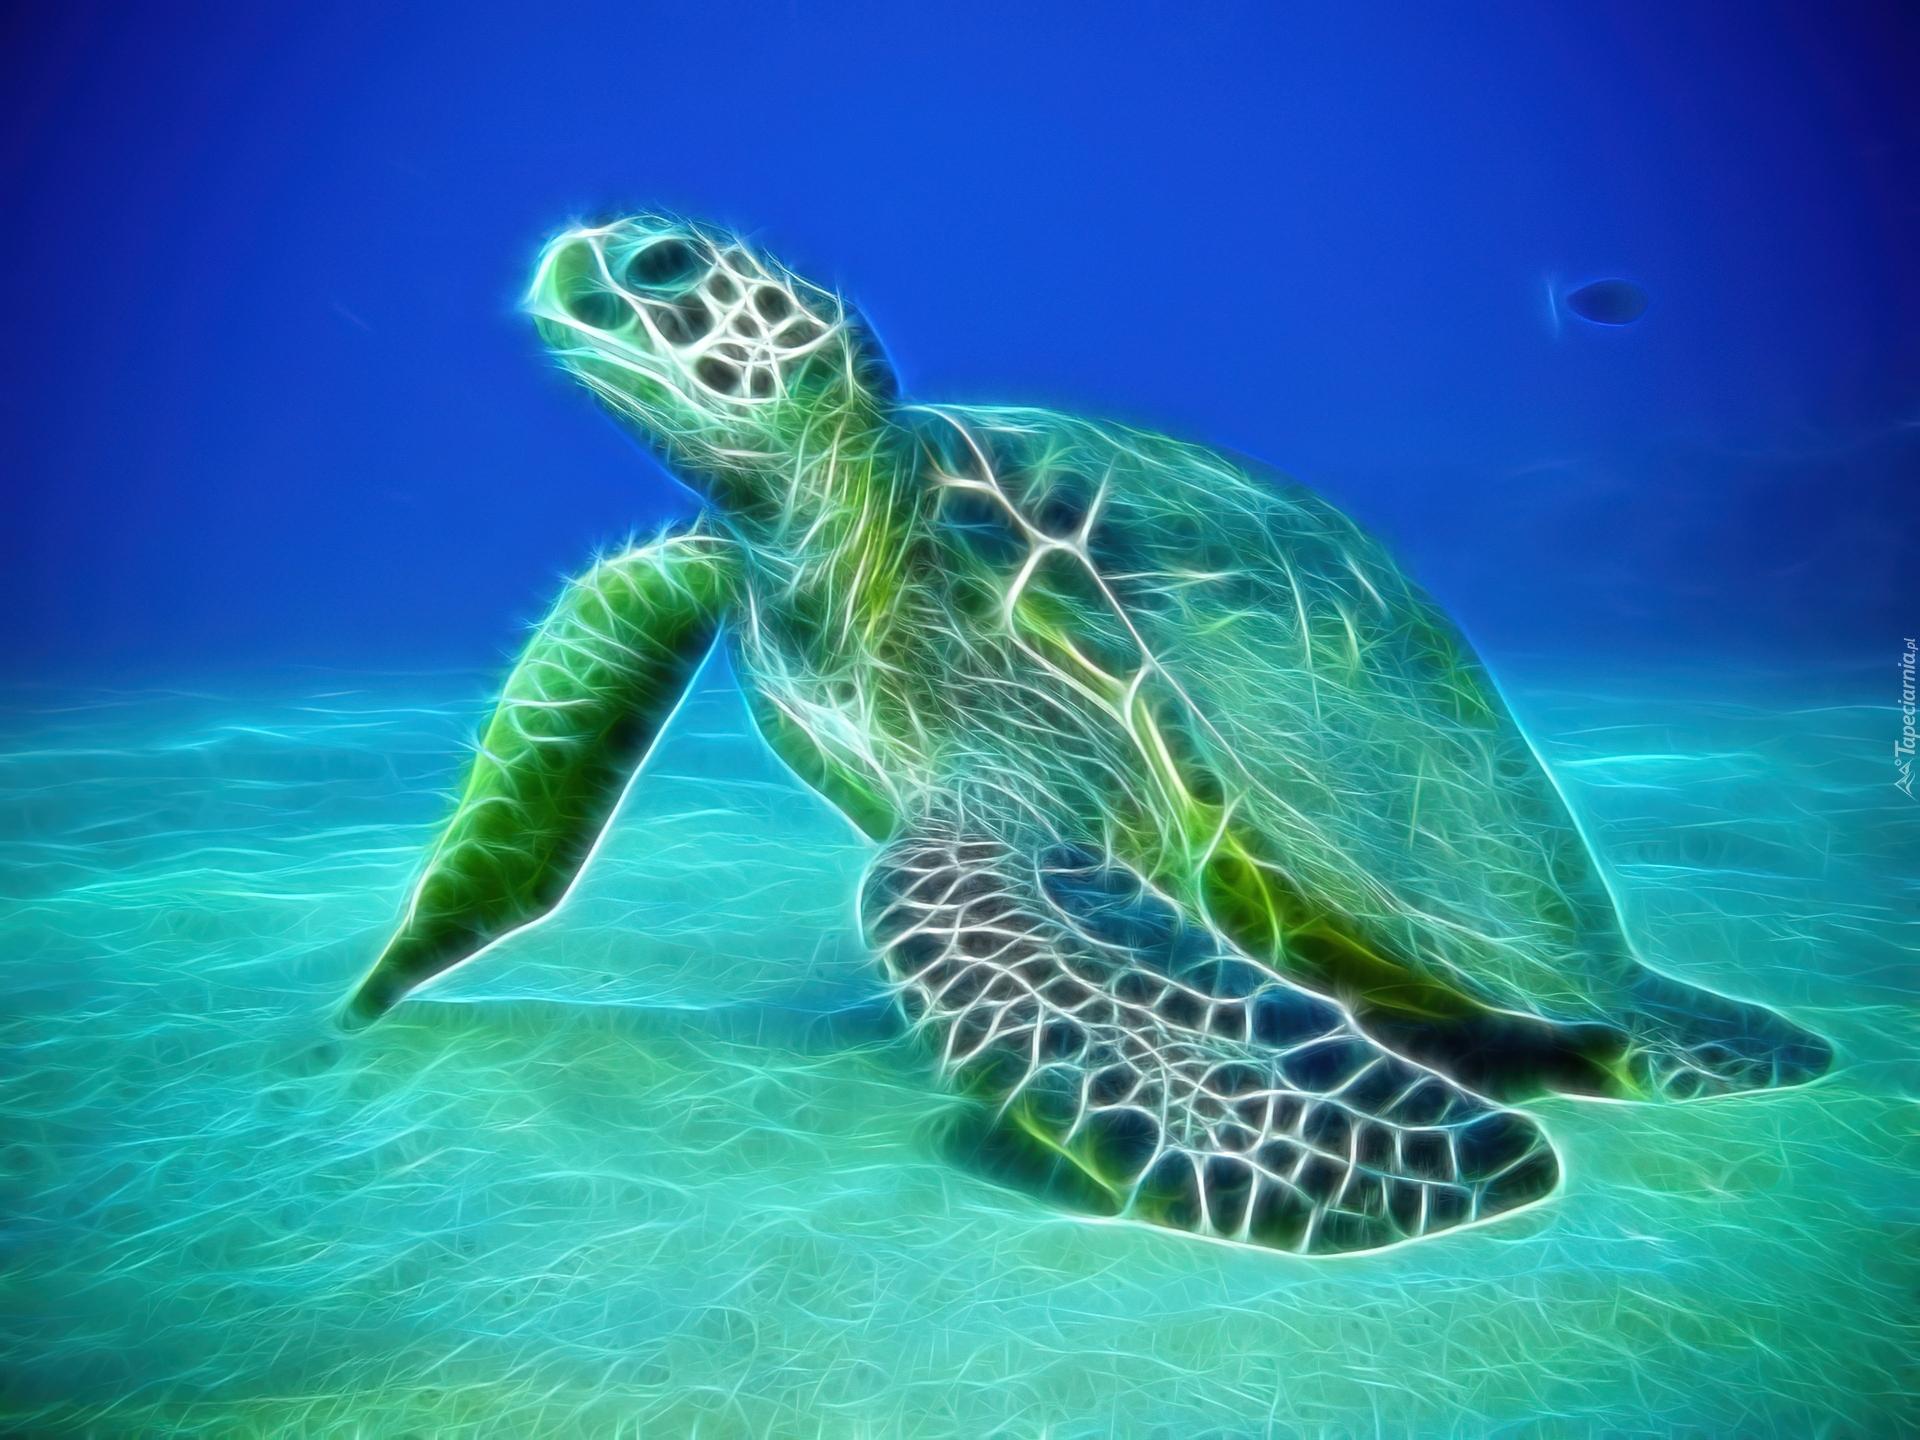 Funny 3d Animal Turtle Wallpapers Hd: Żółw, Wodny, Fractalius